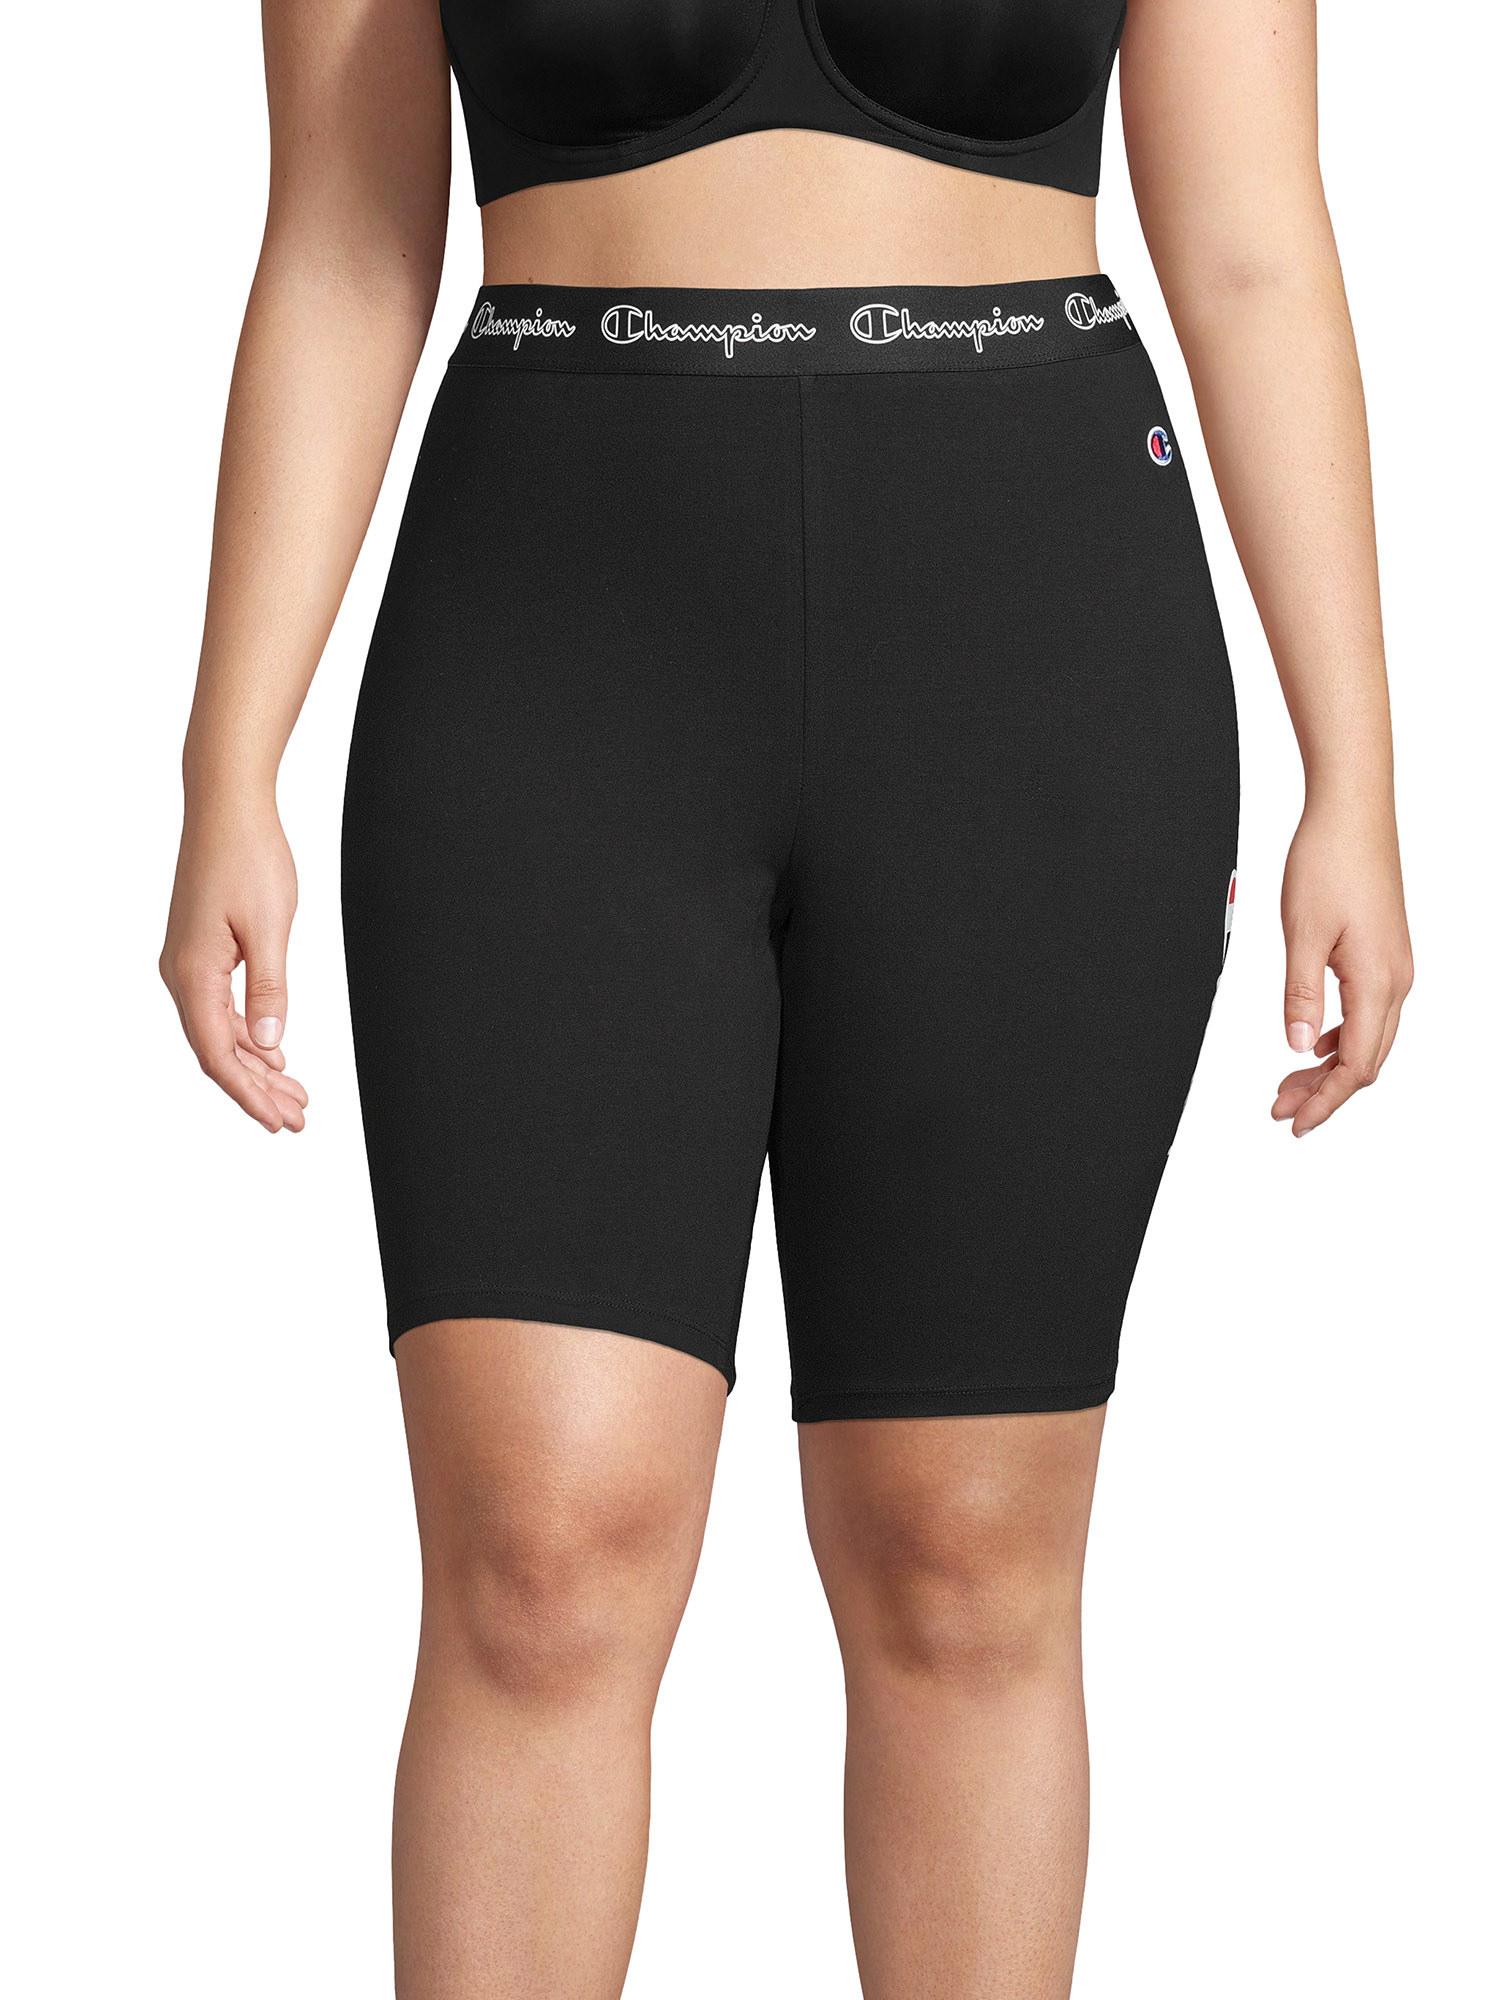 person wearing black bike shorts